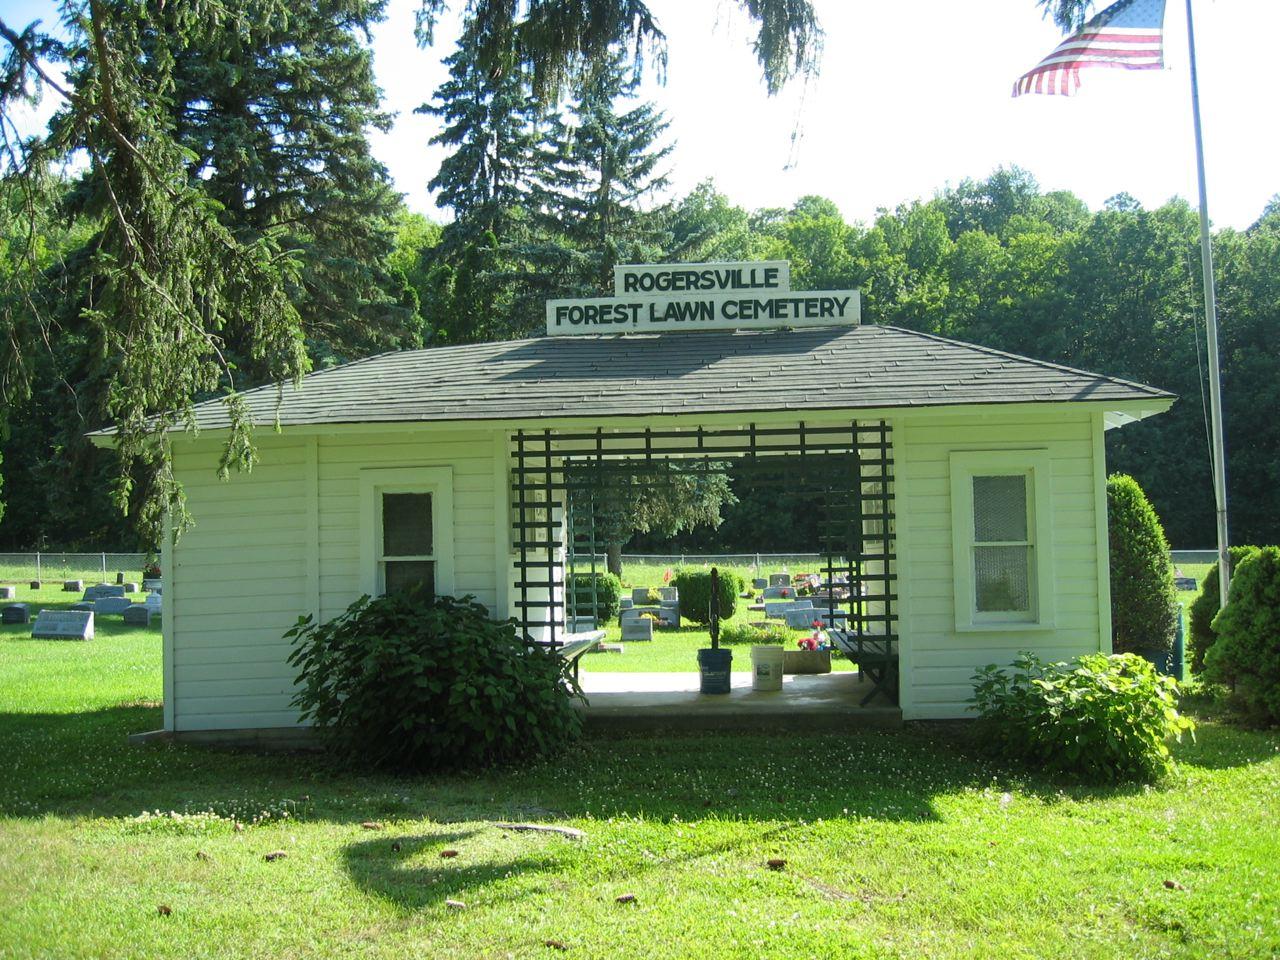 Rogersville Forest Lawn Cemetery